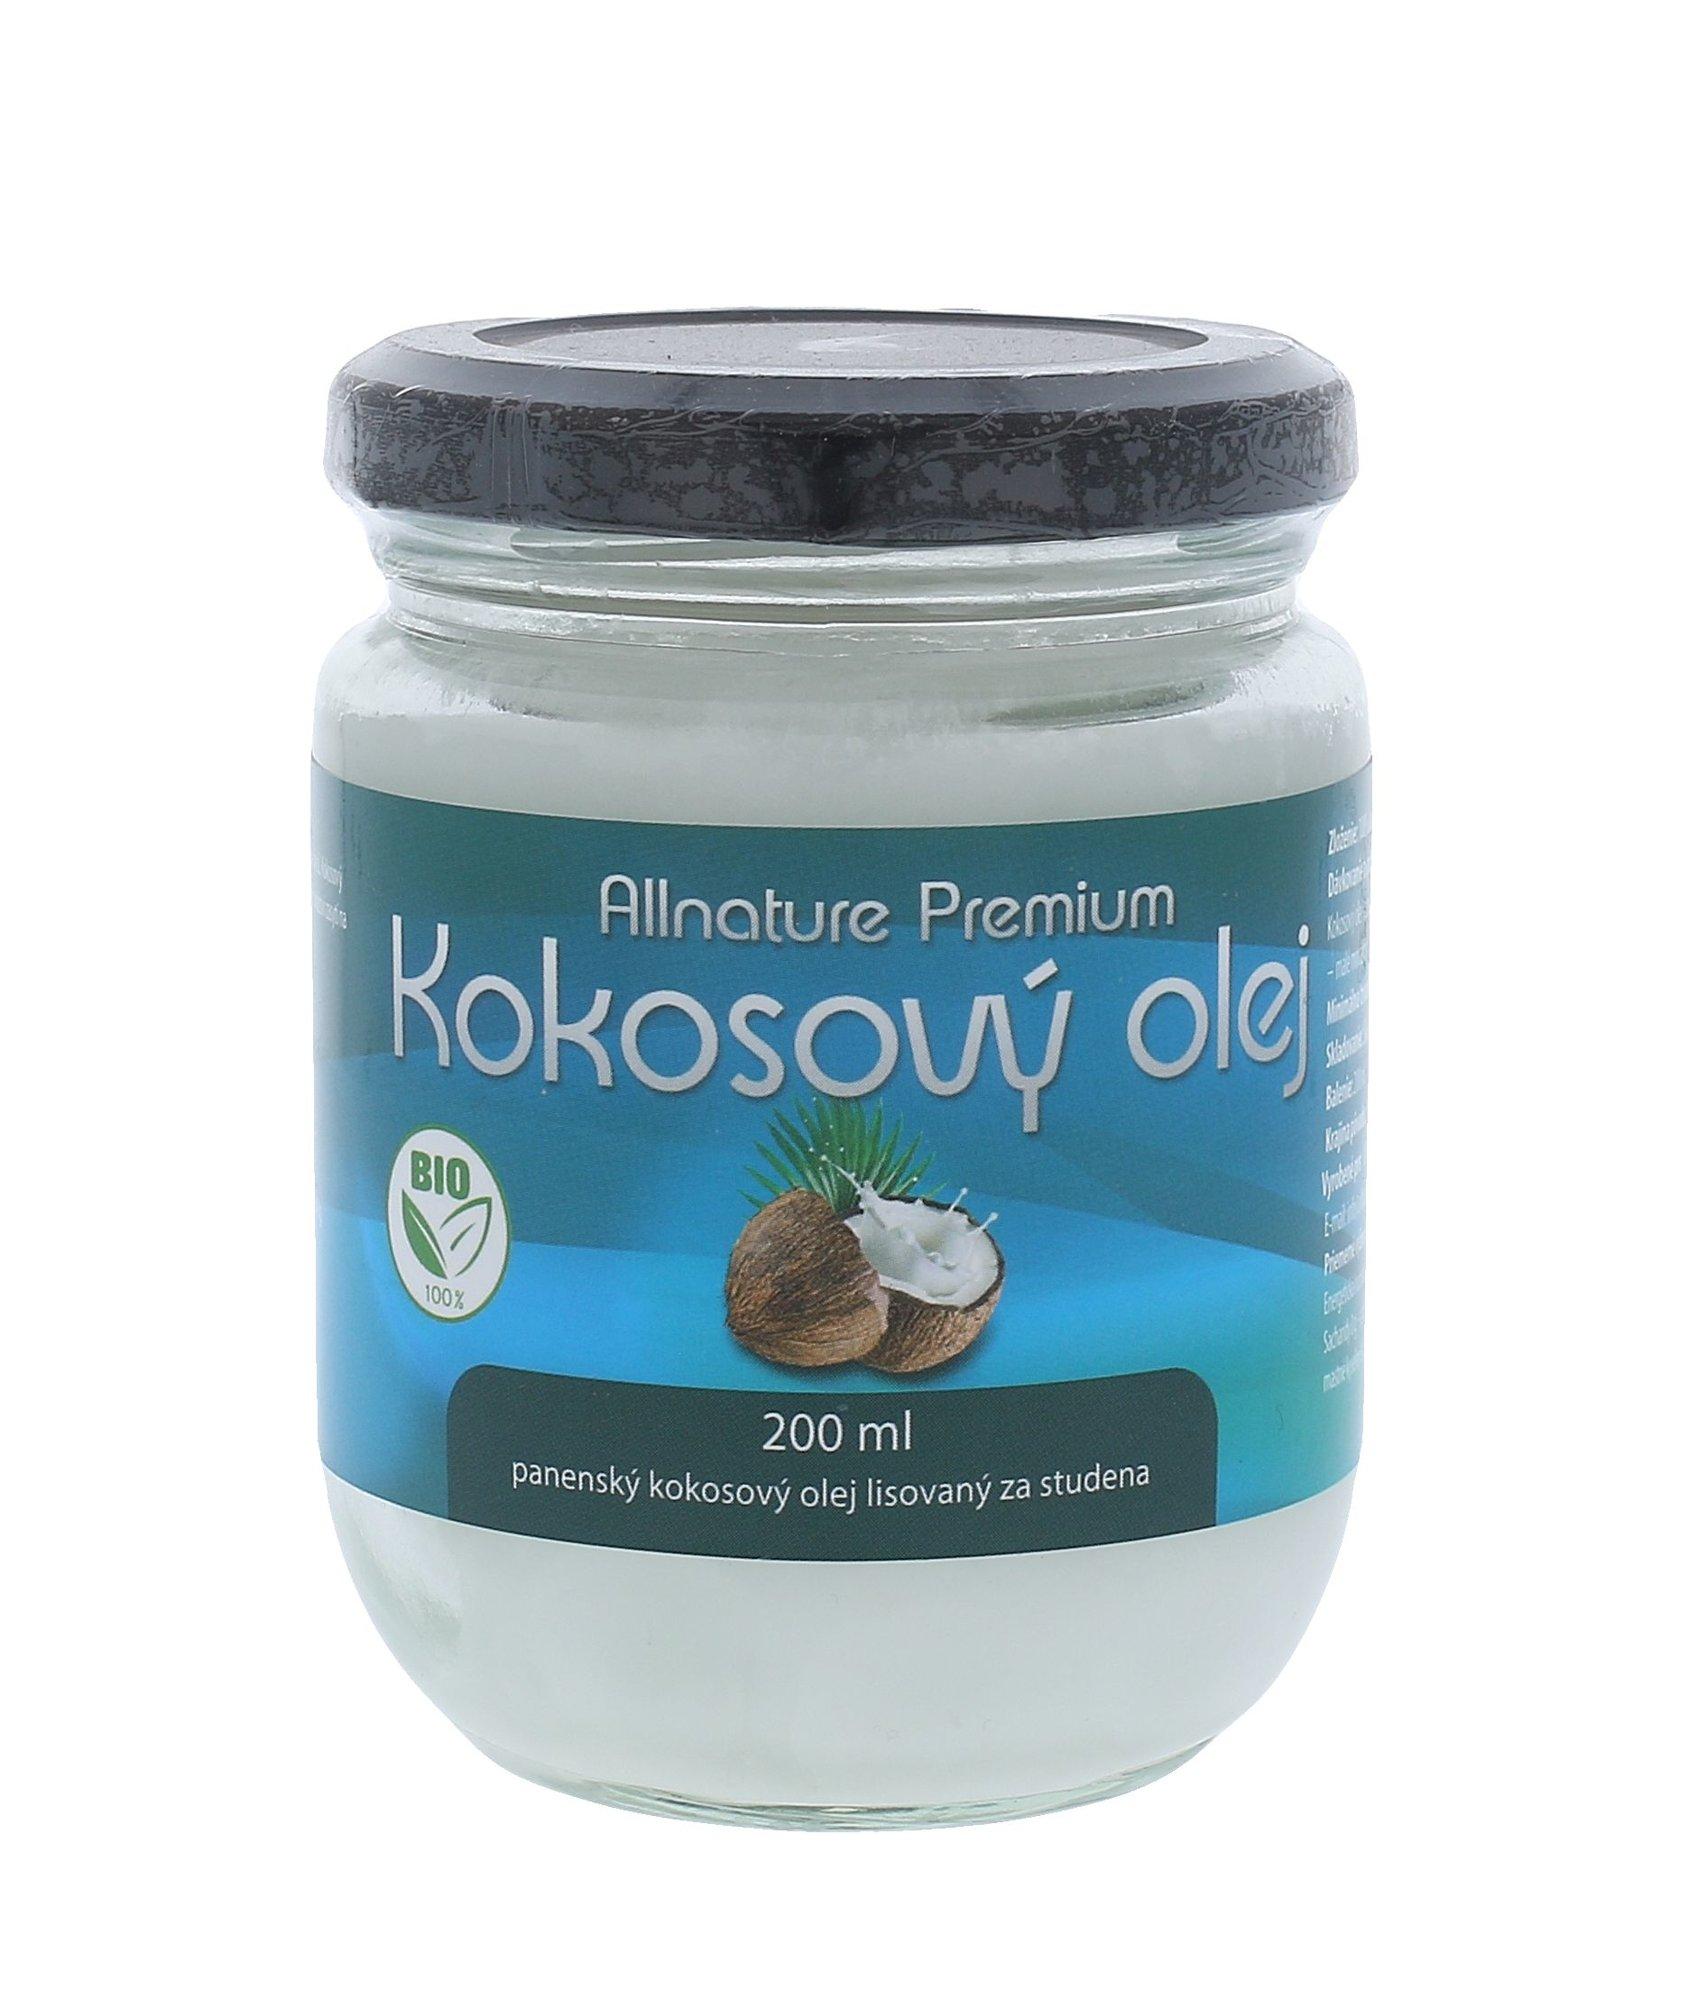 Allnature Premium Bio Coconut Oil Cosmetic 200ml